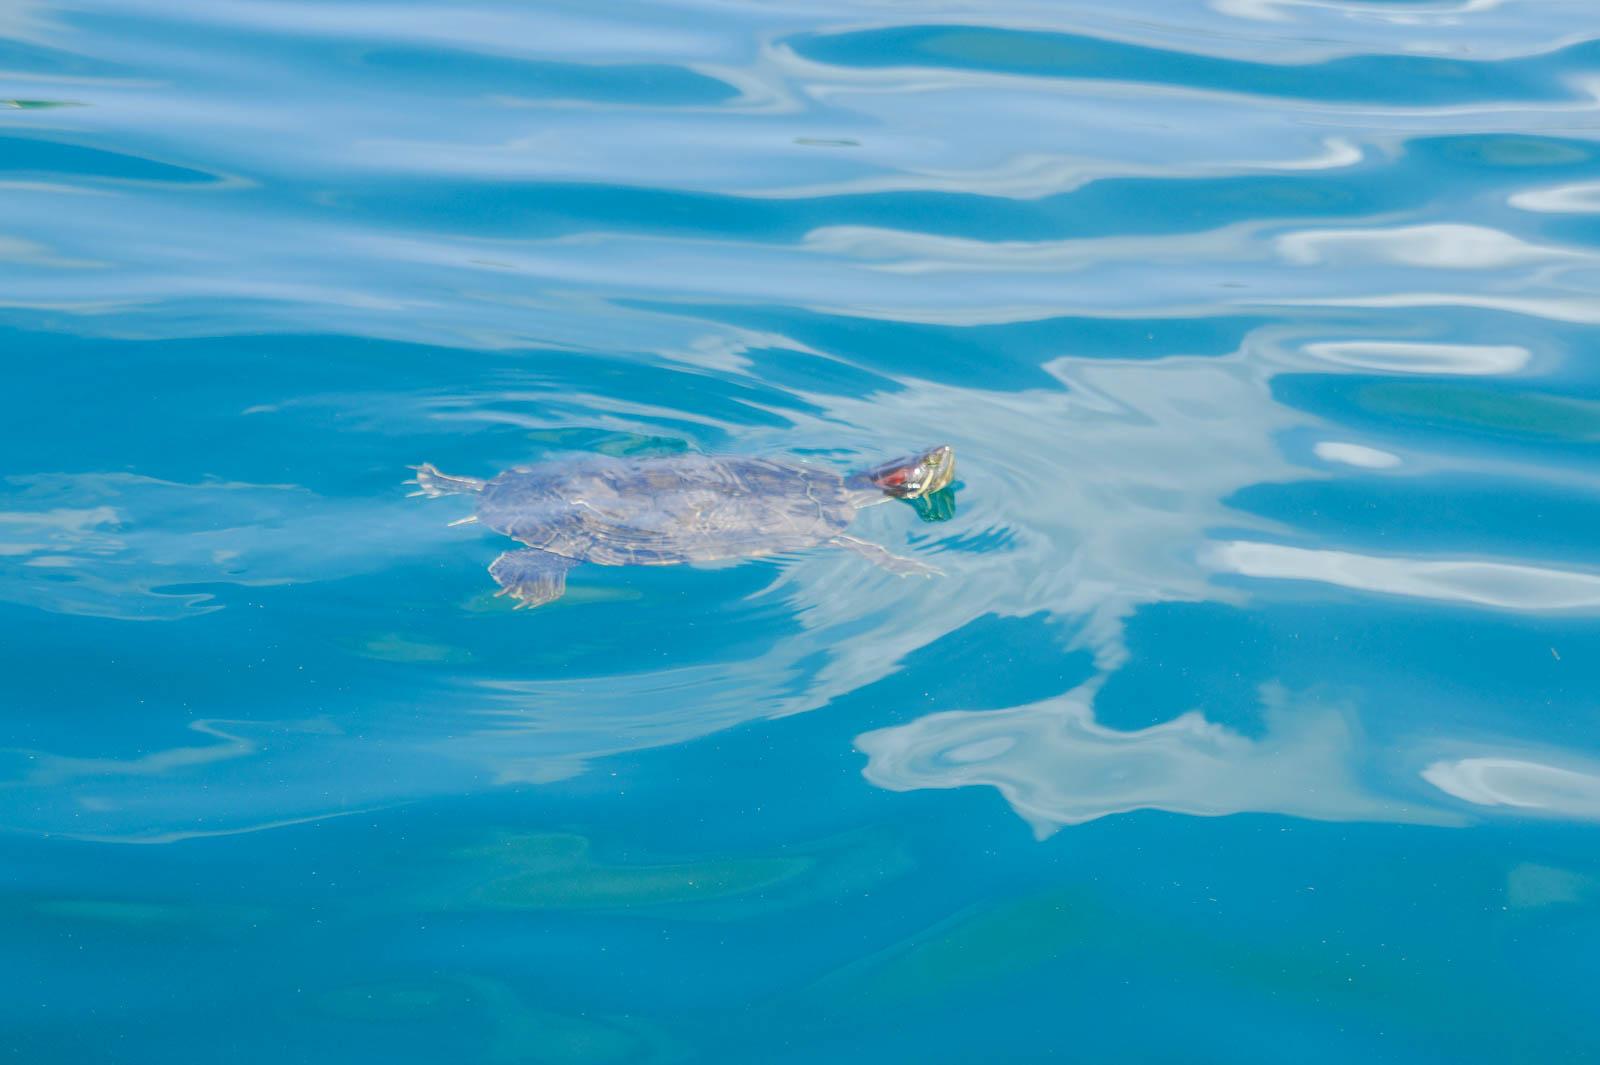 kourna-lake-crete-greece-la-vie-en-blog-all-rights-reserved-13